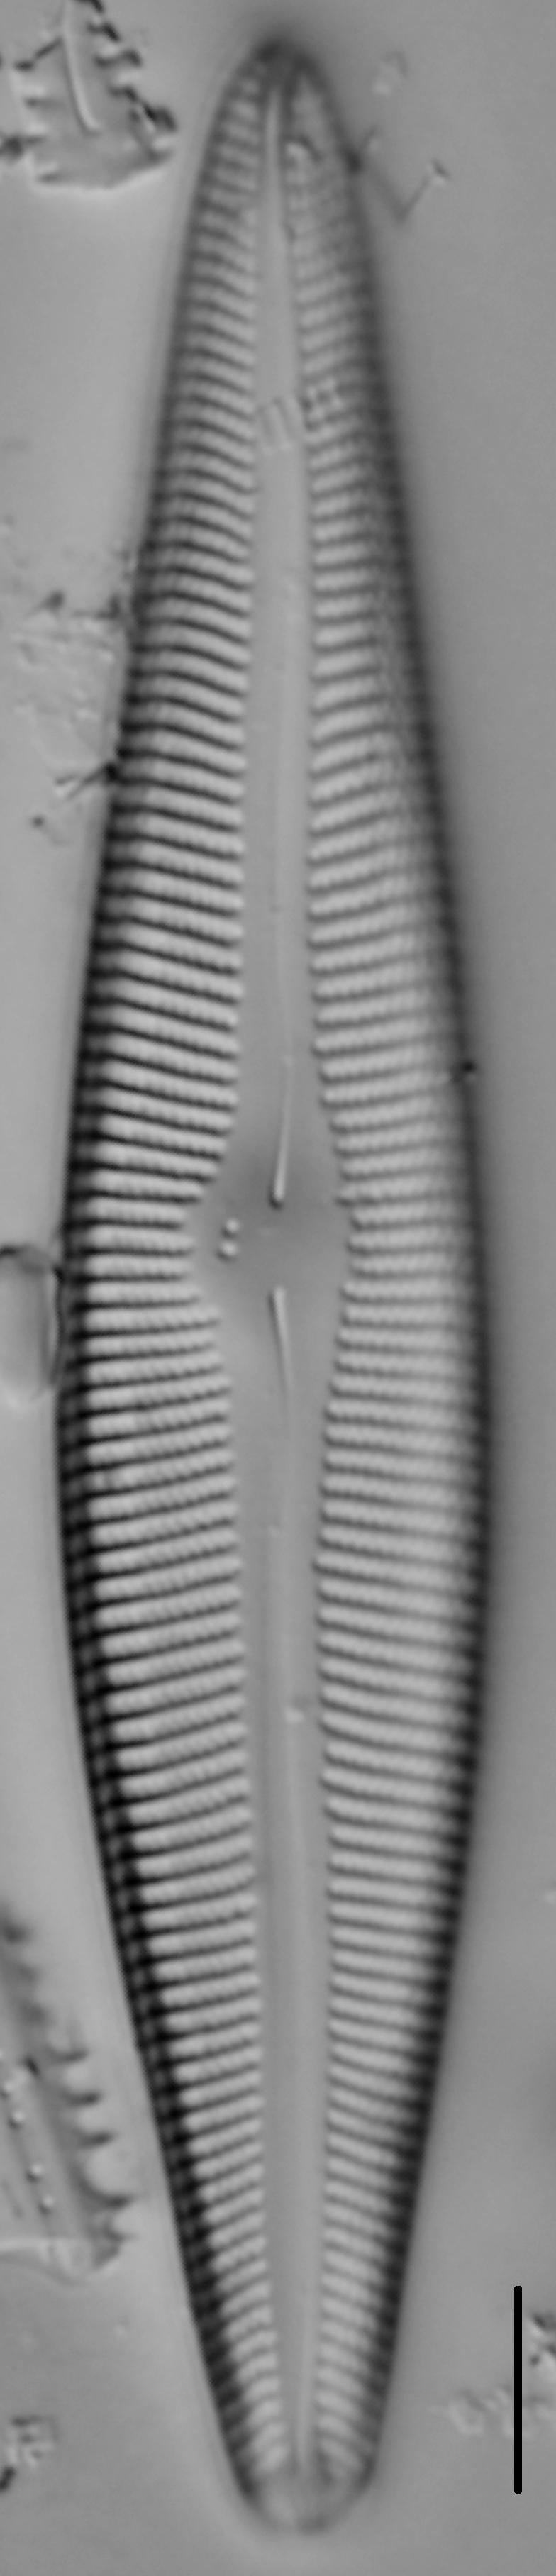 Gomphoneis trullata LM1